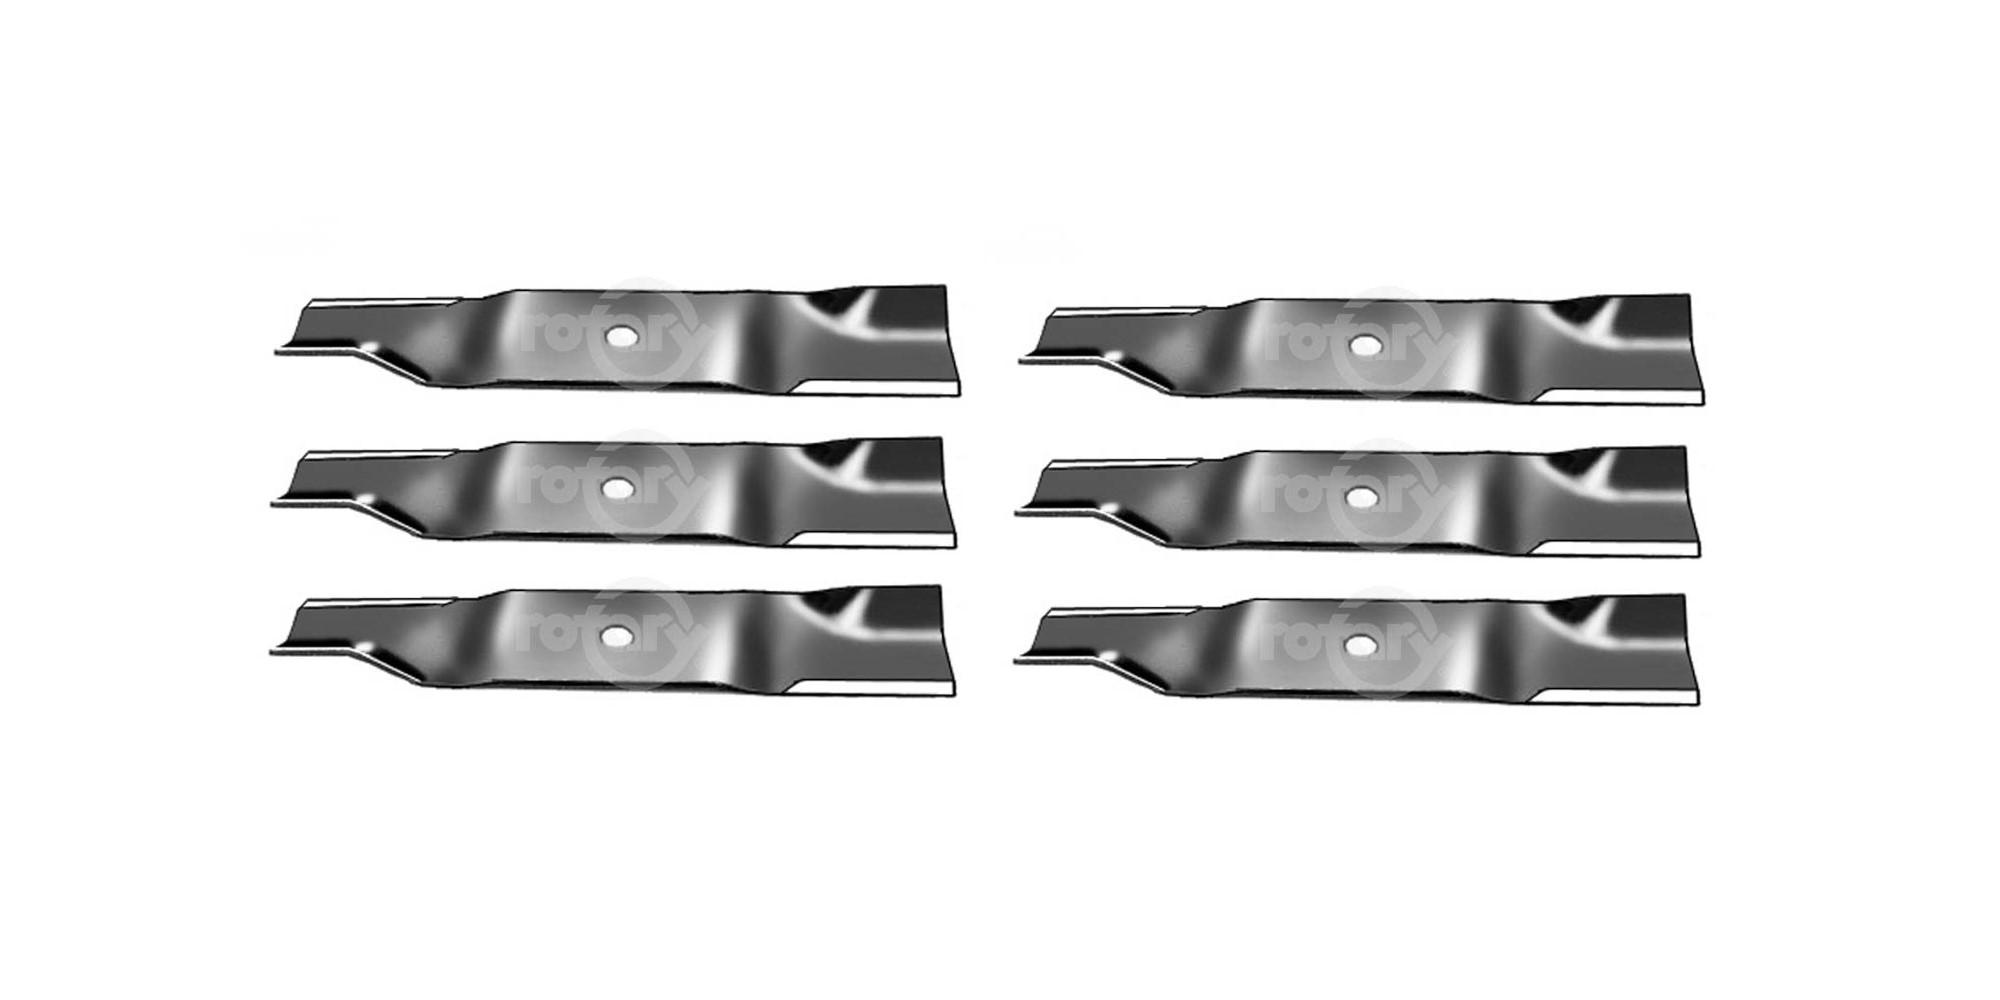 6 Pack Blades Fits Cub Cadet MTD 02005017 1005336 742-04417 942-04417 942-04417A